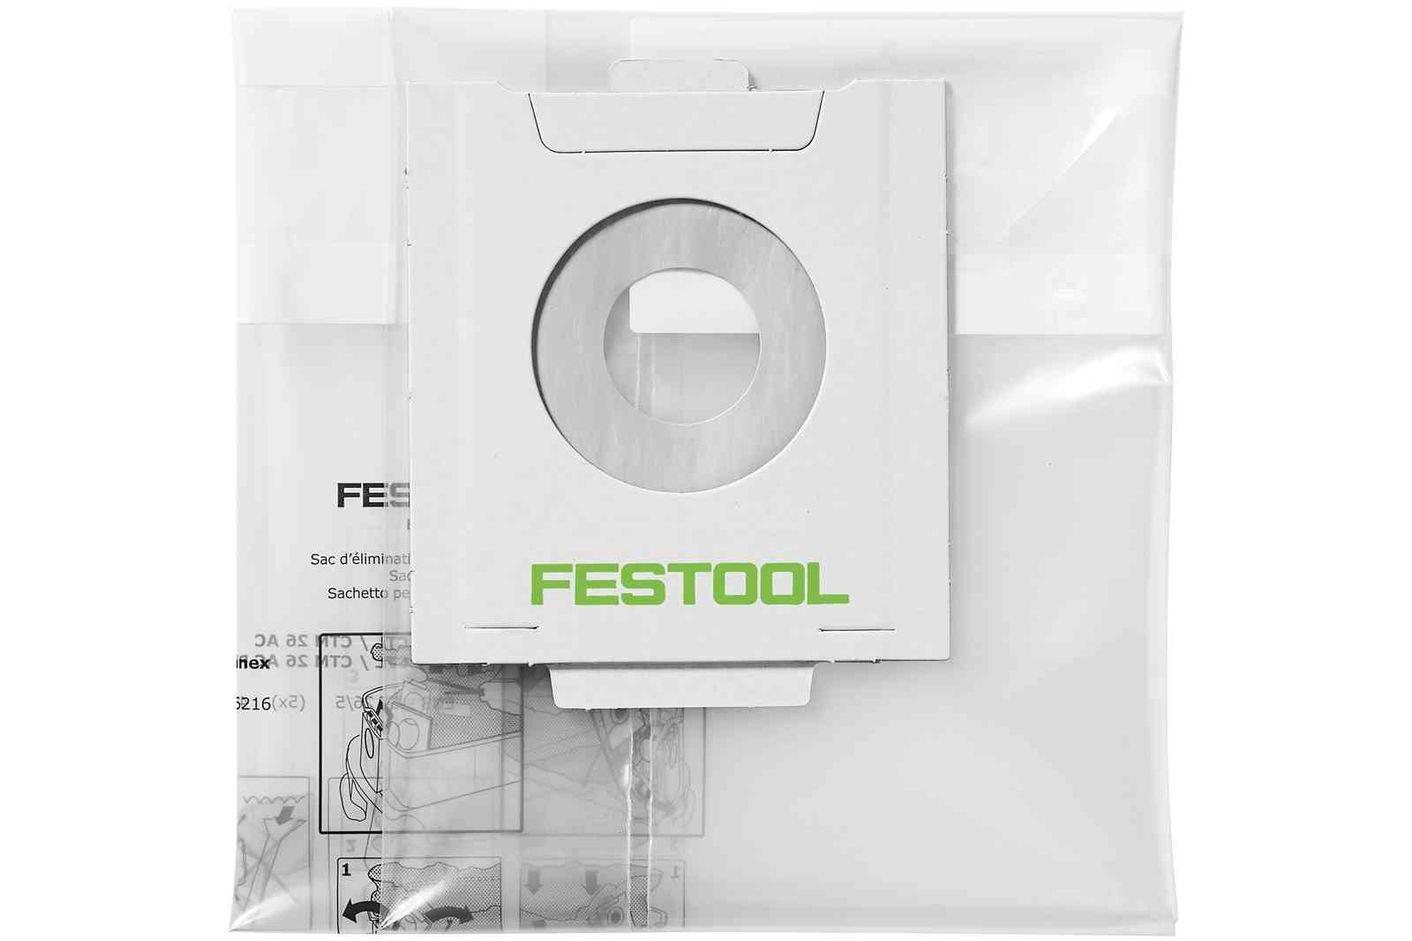 Festool Sac de reziduri, de unica folosinta ENS-CT 26 AC/5 imagine 2021